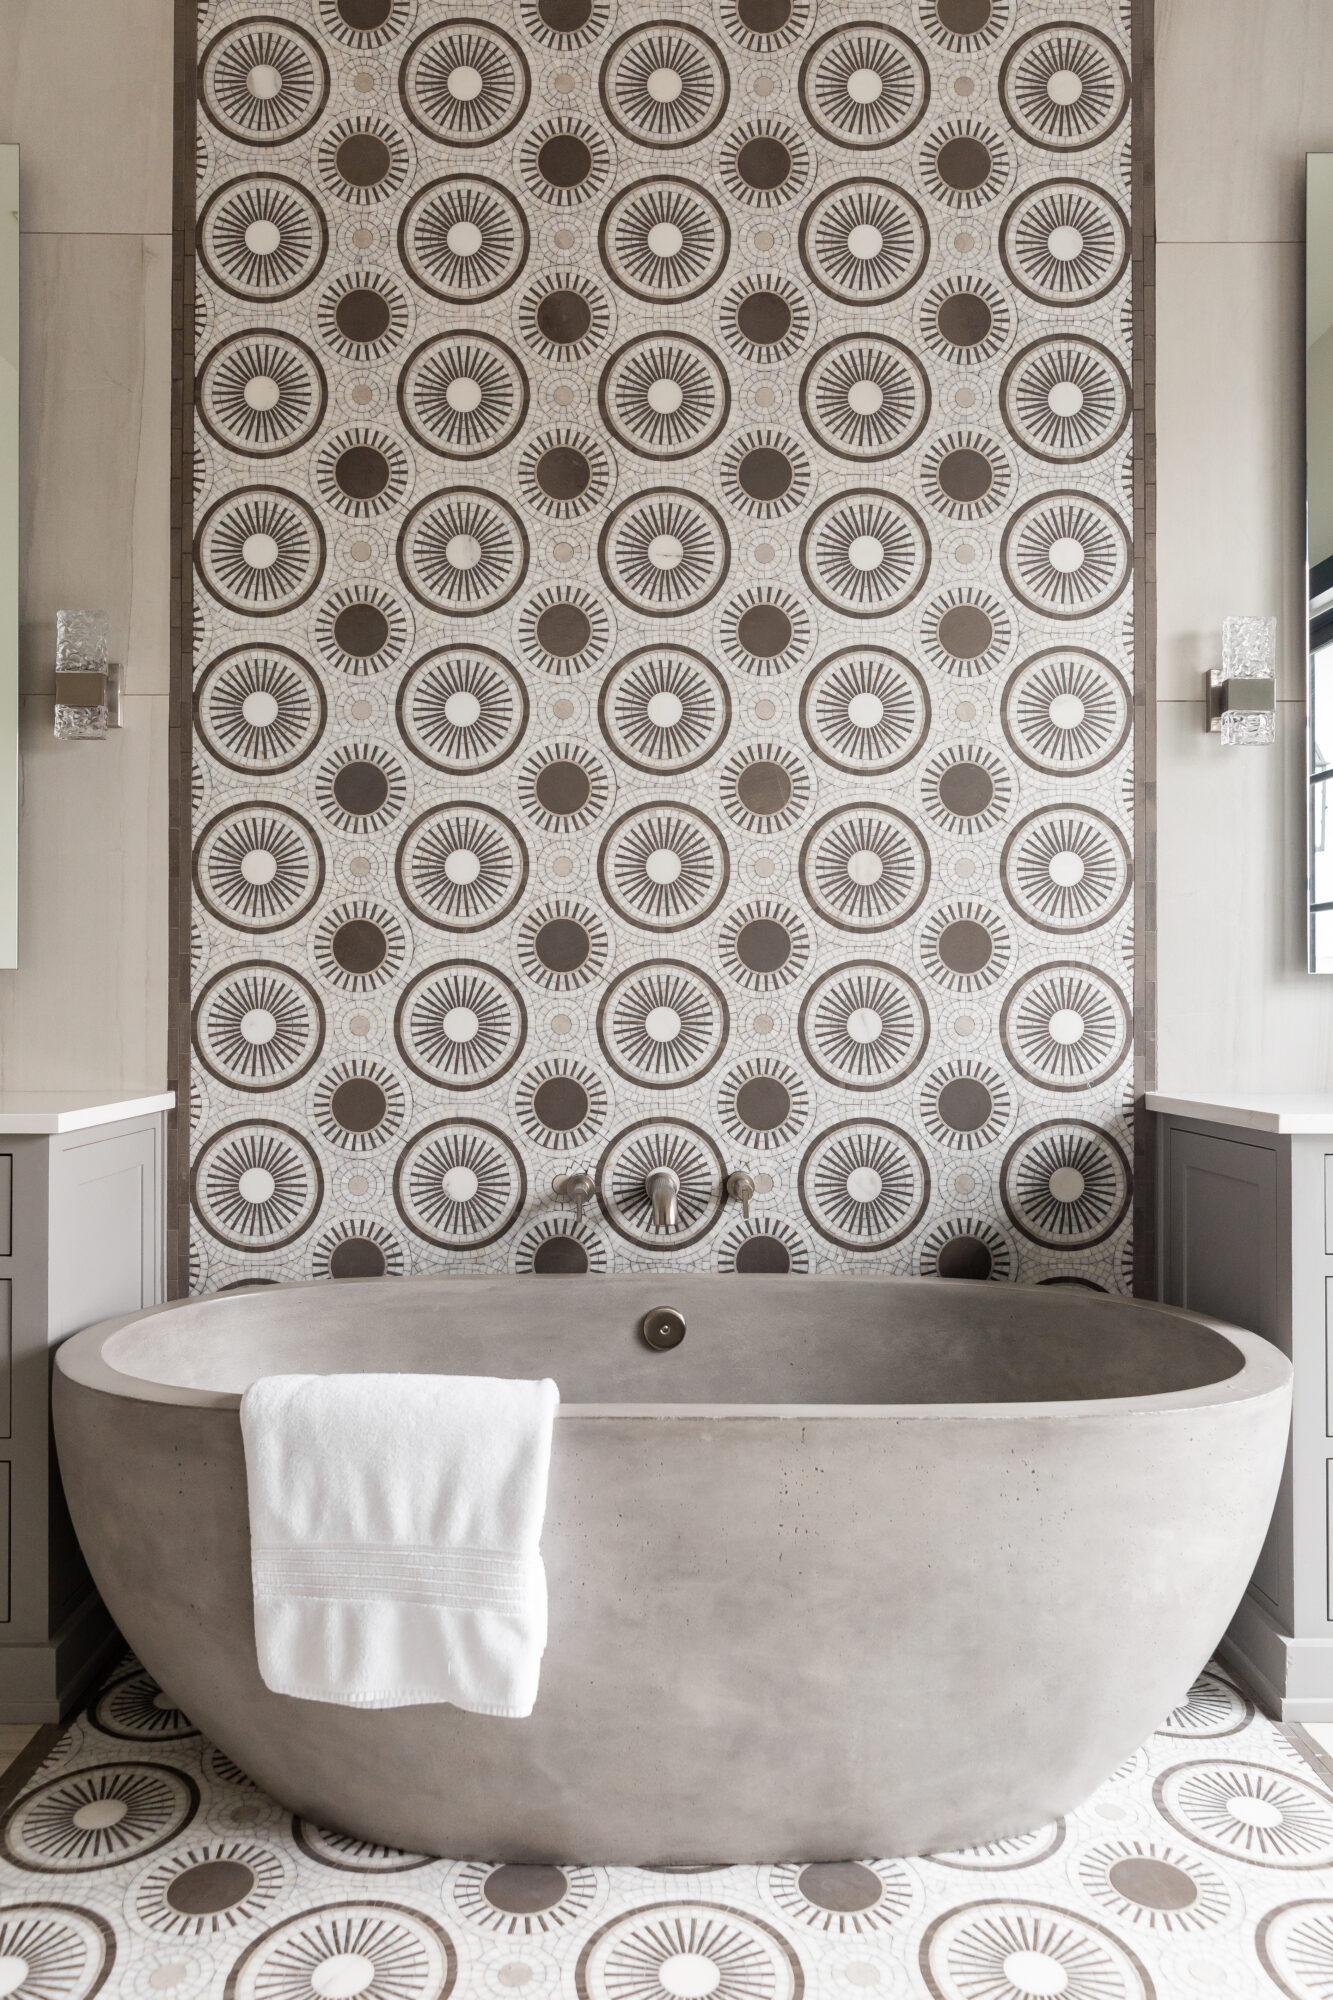 free standing gray stone tub with tile backsplash